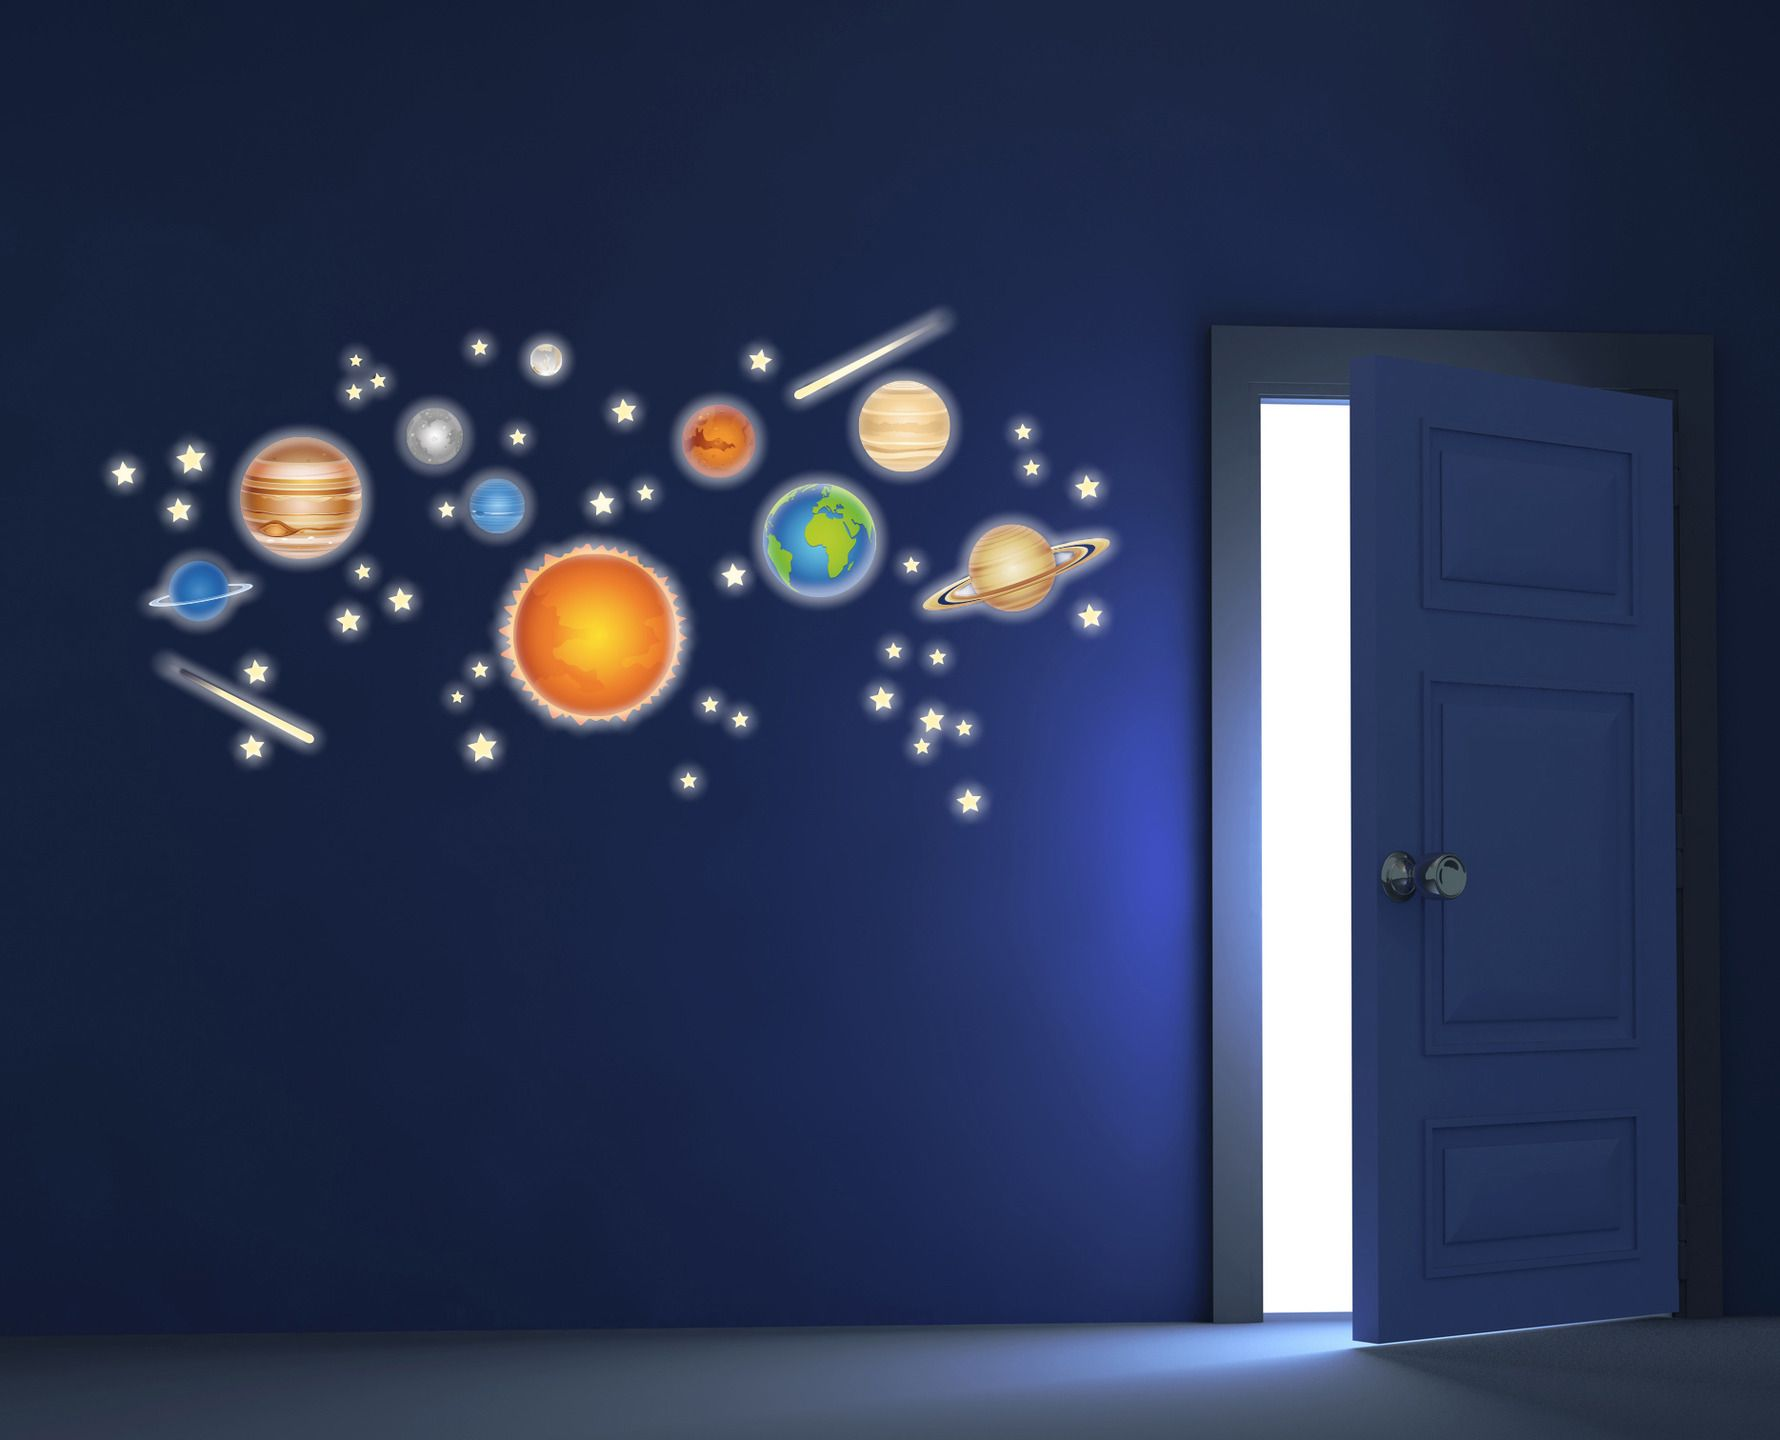 Pianeti sistema solare spazio adesivi murali fluo - Adesivi camera bimbi ...